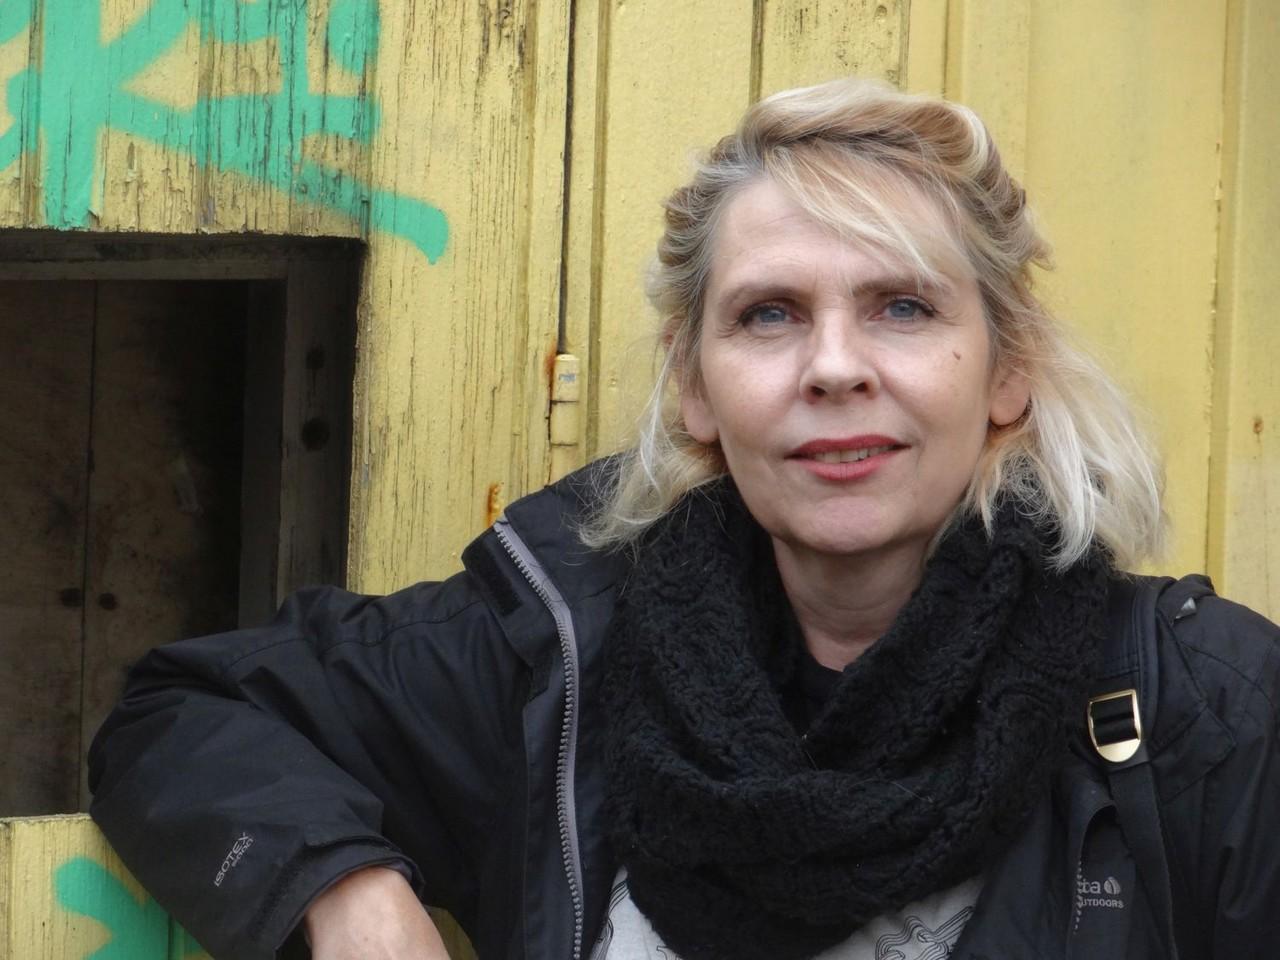 Birgitta Jonsdottir finds silence after decade of turbulence